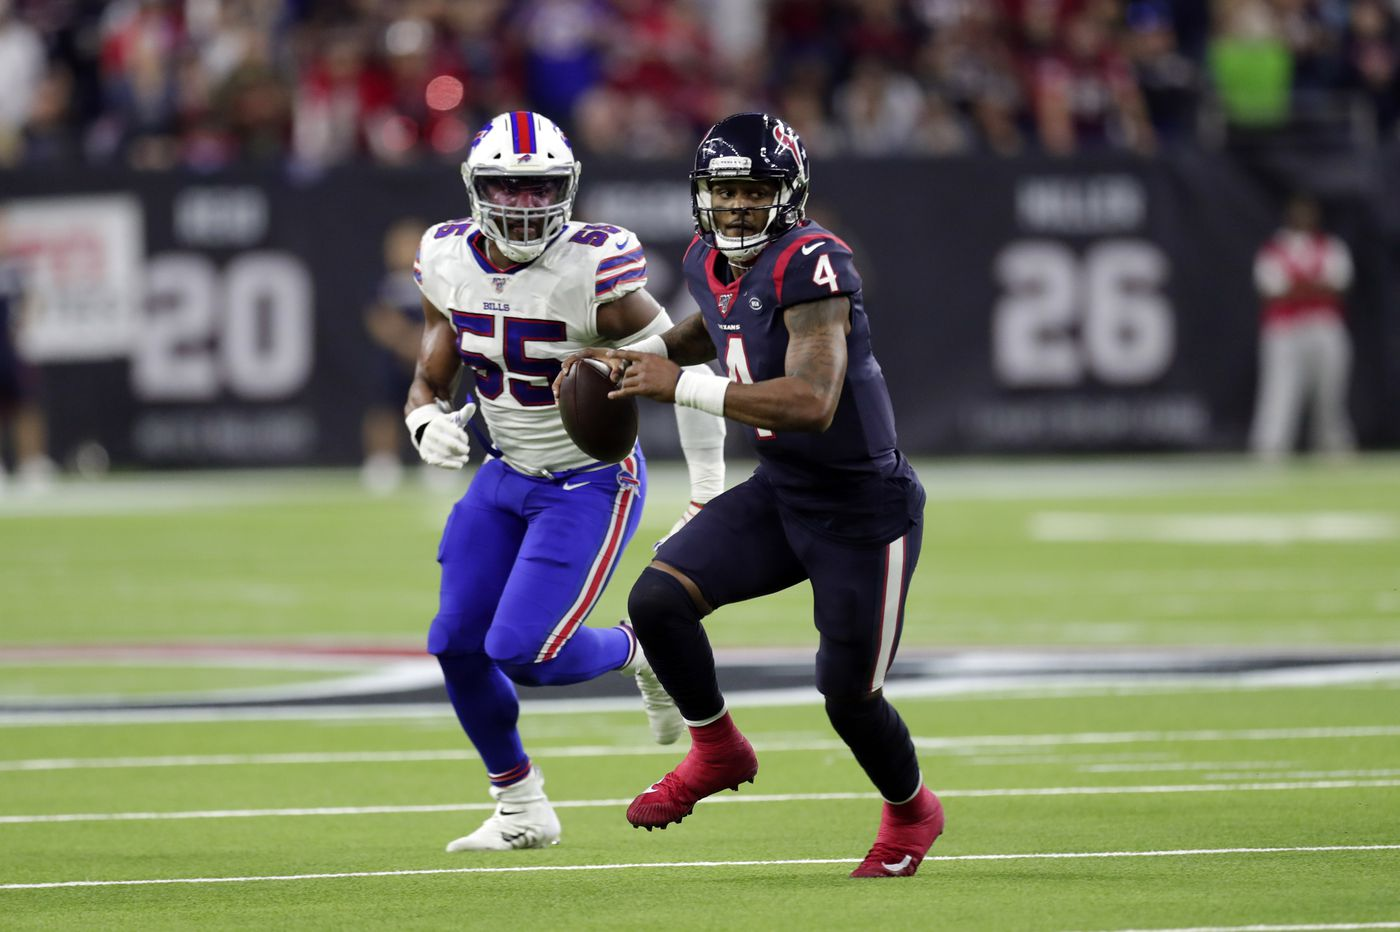 Deshaun Watson leads Texans over Bills in AFC wild-card game